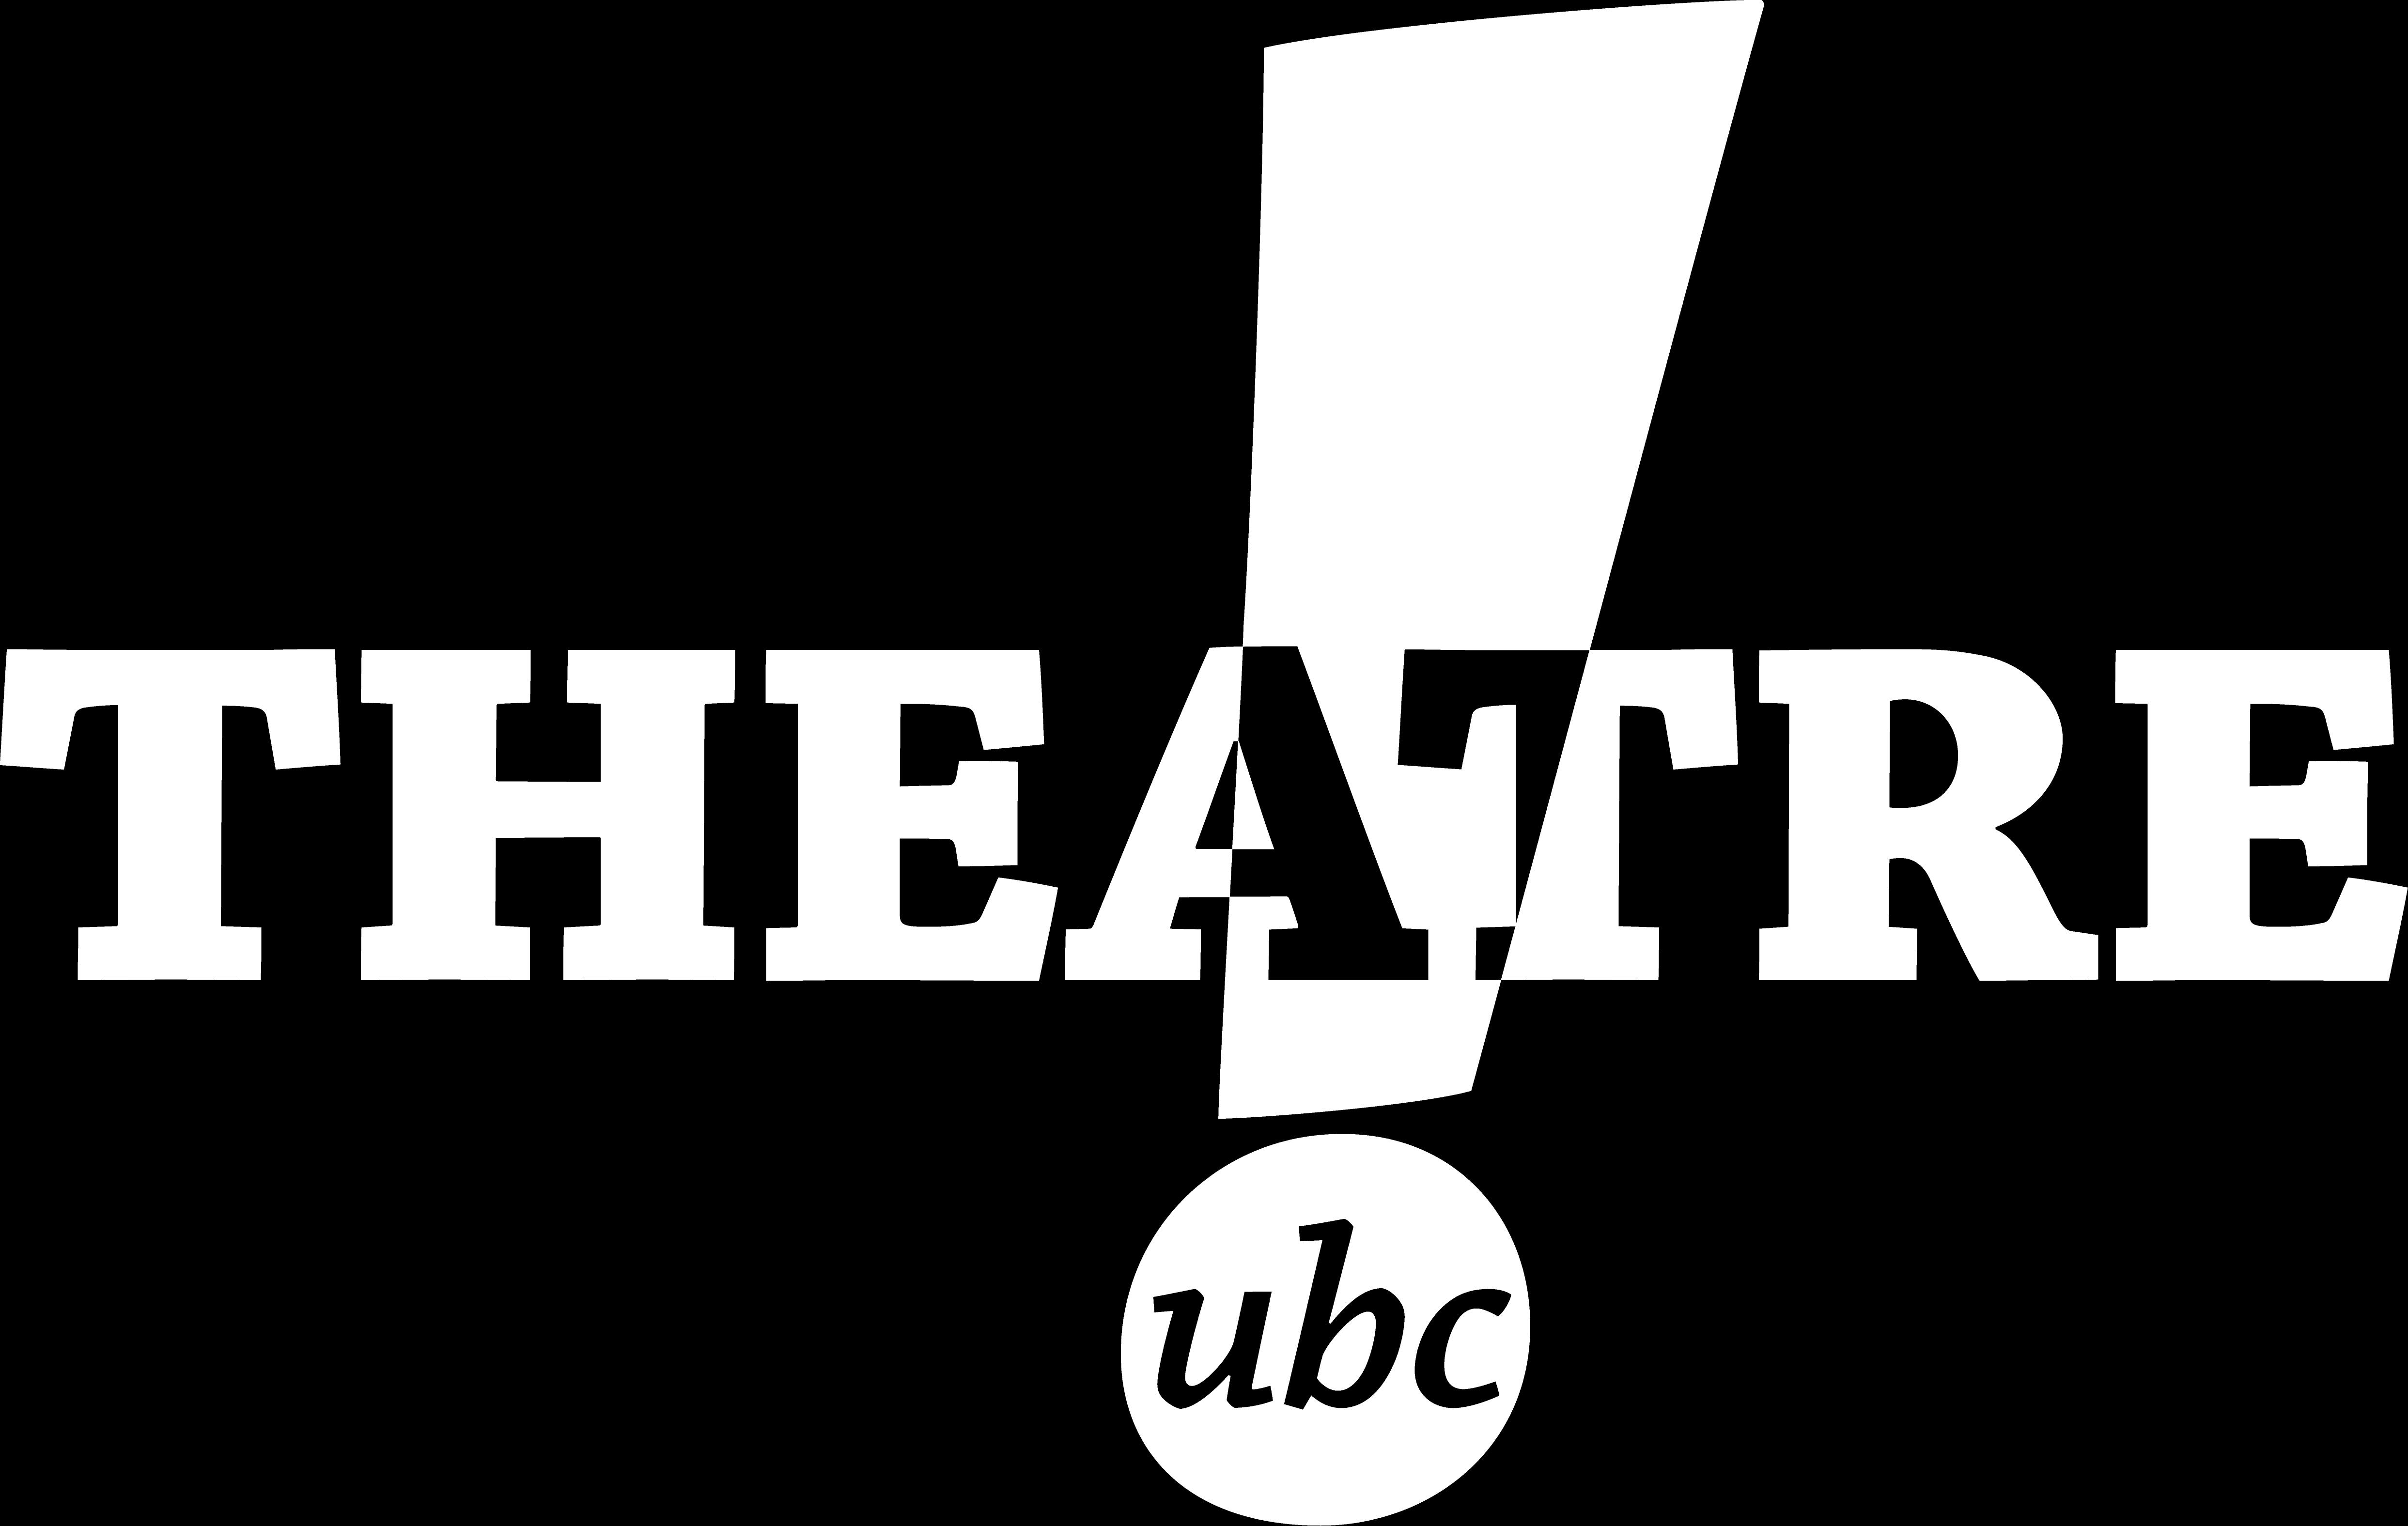 Theatre and Film Department at UBC